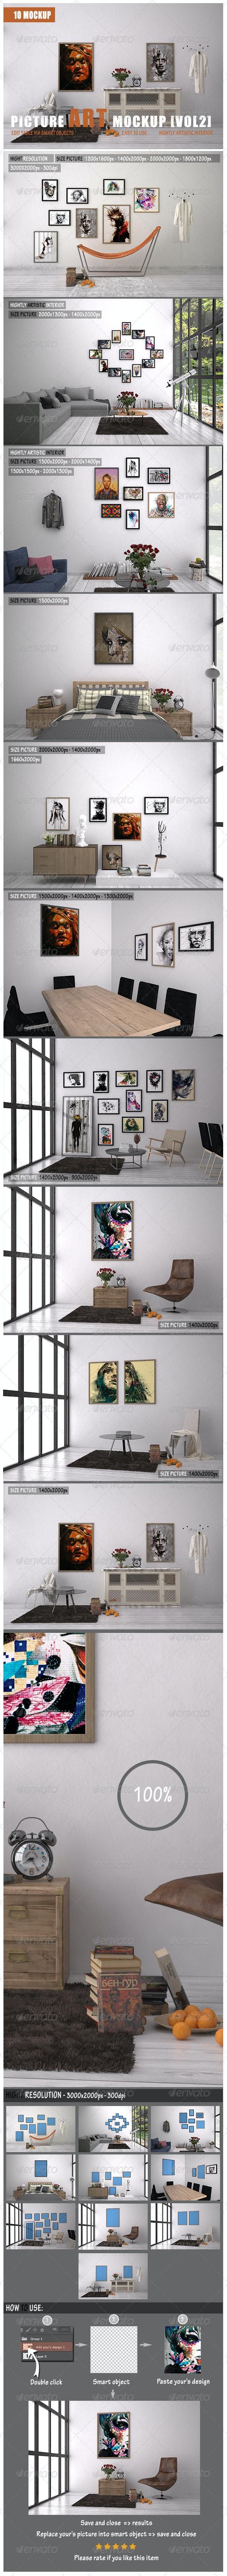 Picture Art Mockup [Vol 2] - Miscellaneous Print